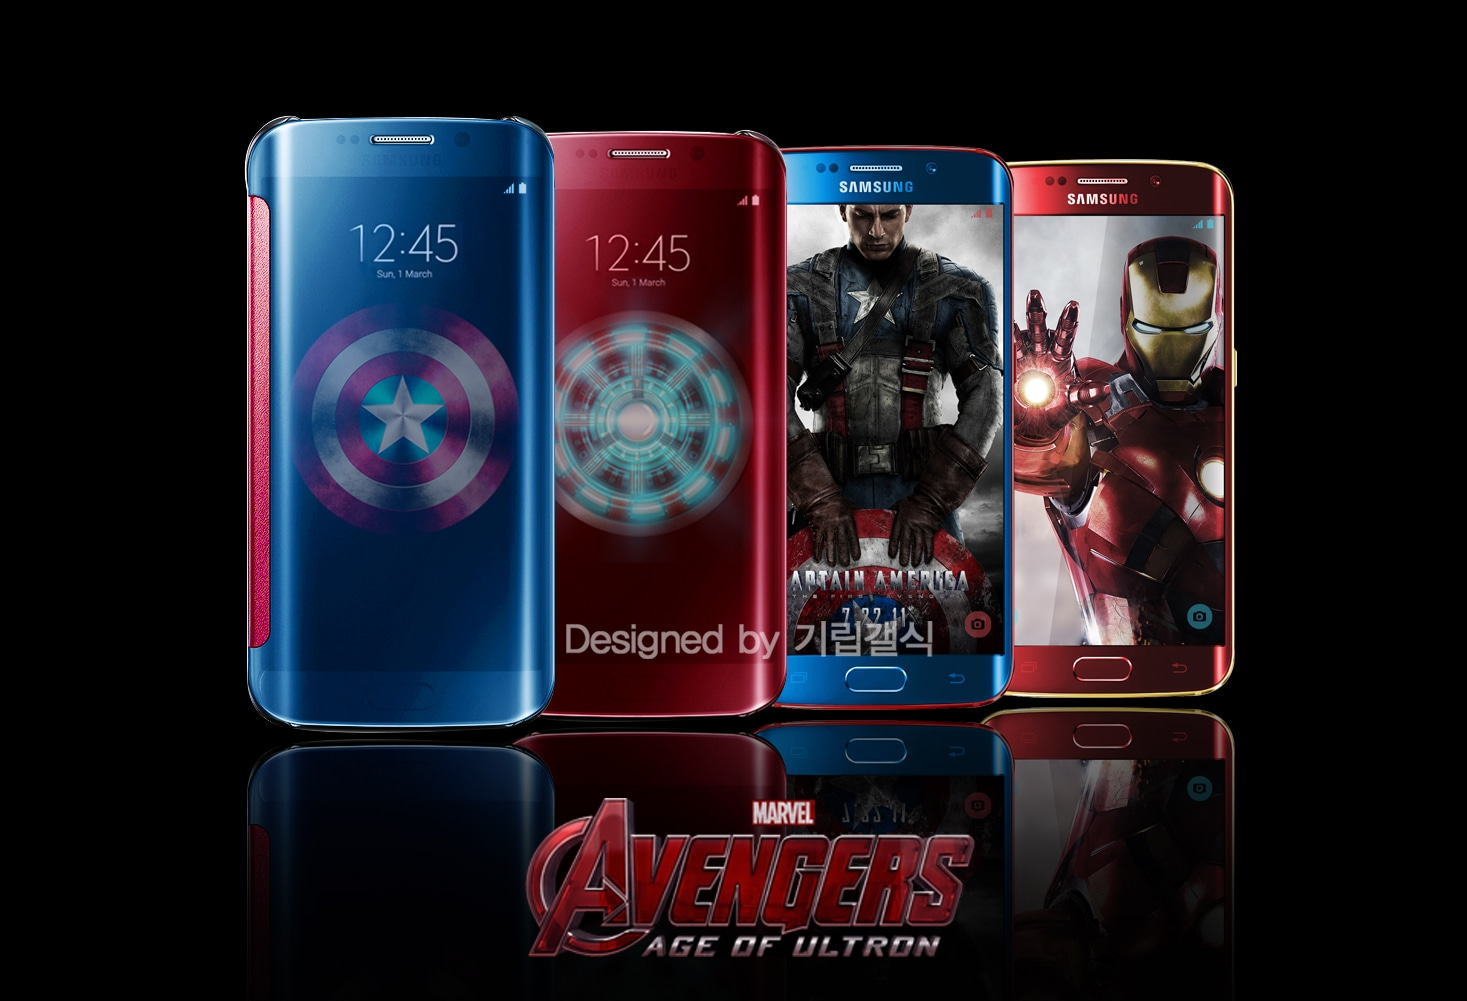 Galaxy S6 ed S6 Edge Avenger Age of Ultron – 11